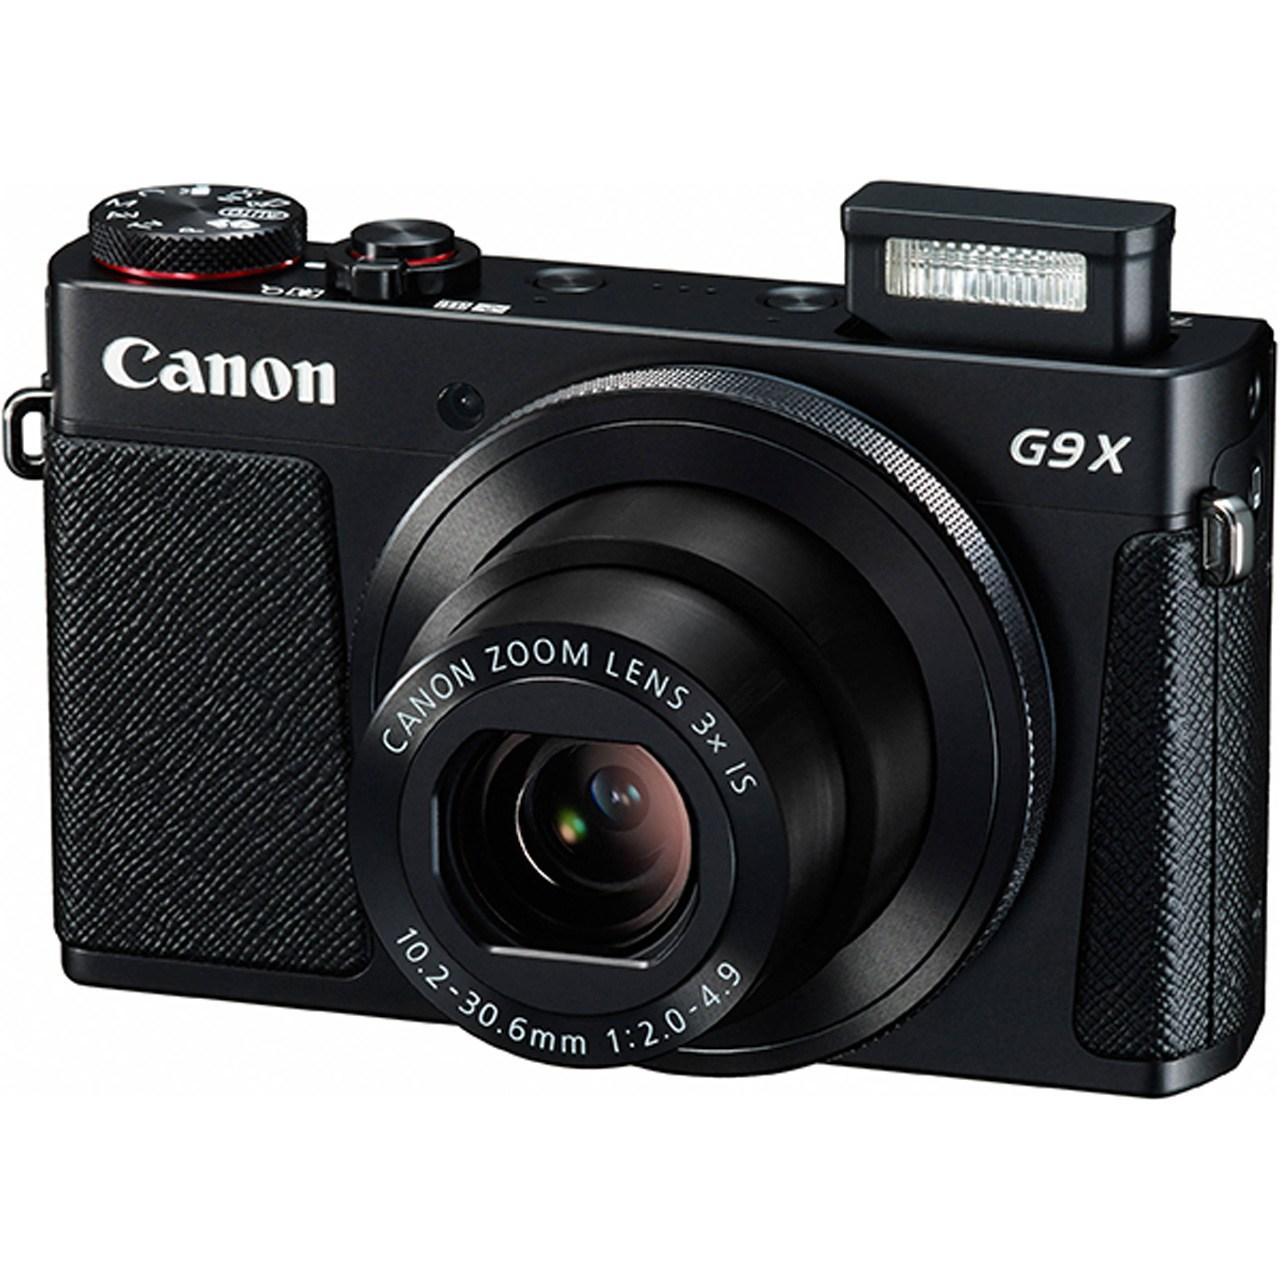 دوربين ديجيتال کانن مدل Canon Powershot G9X Digital Camera